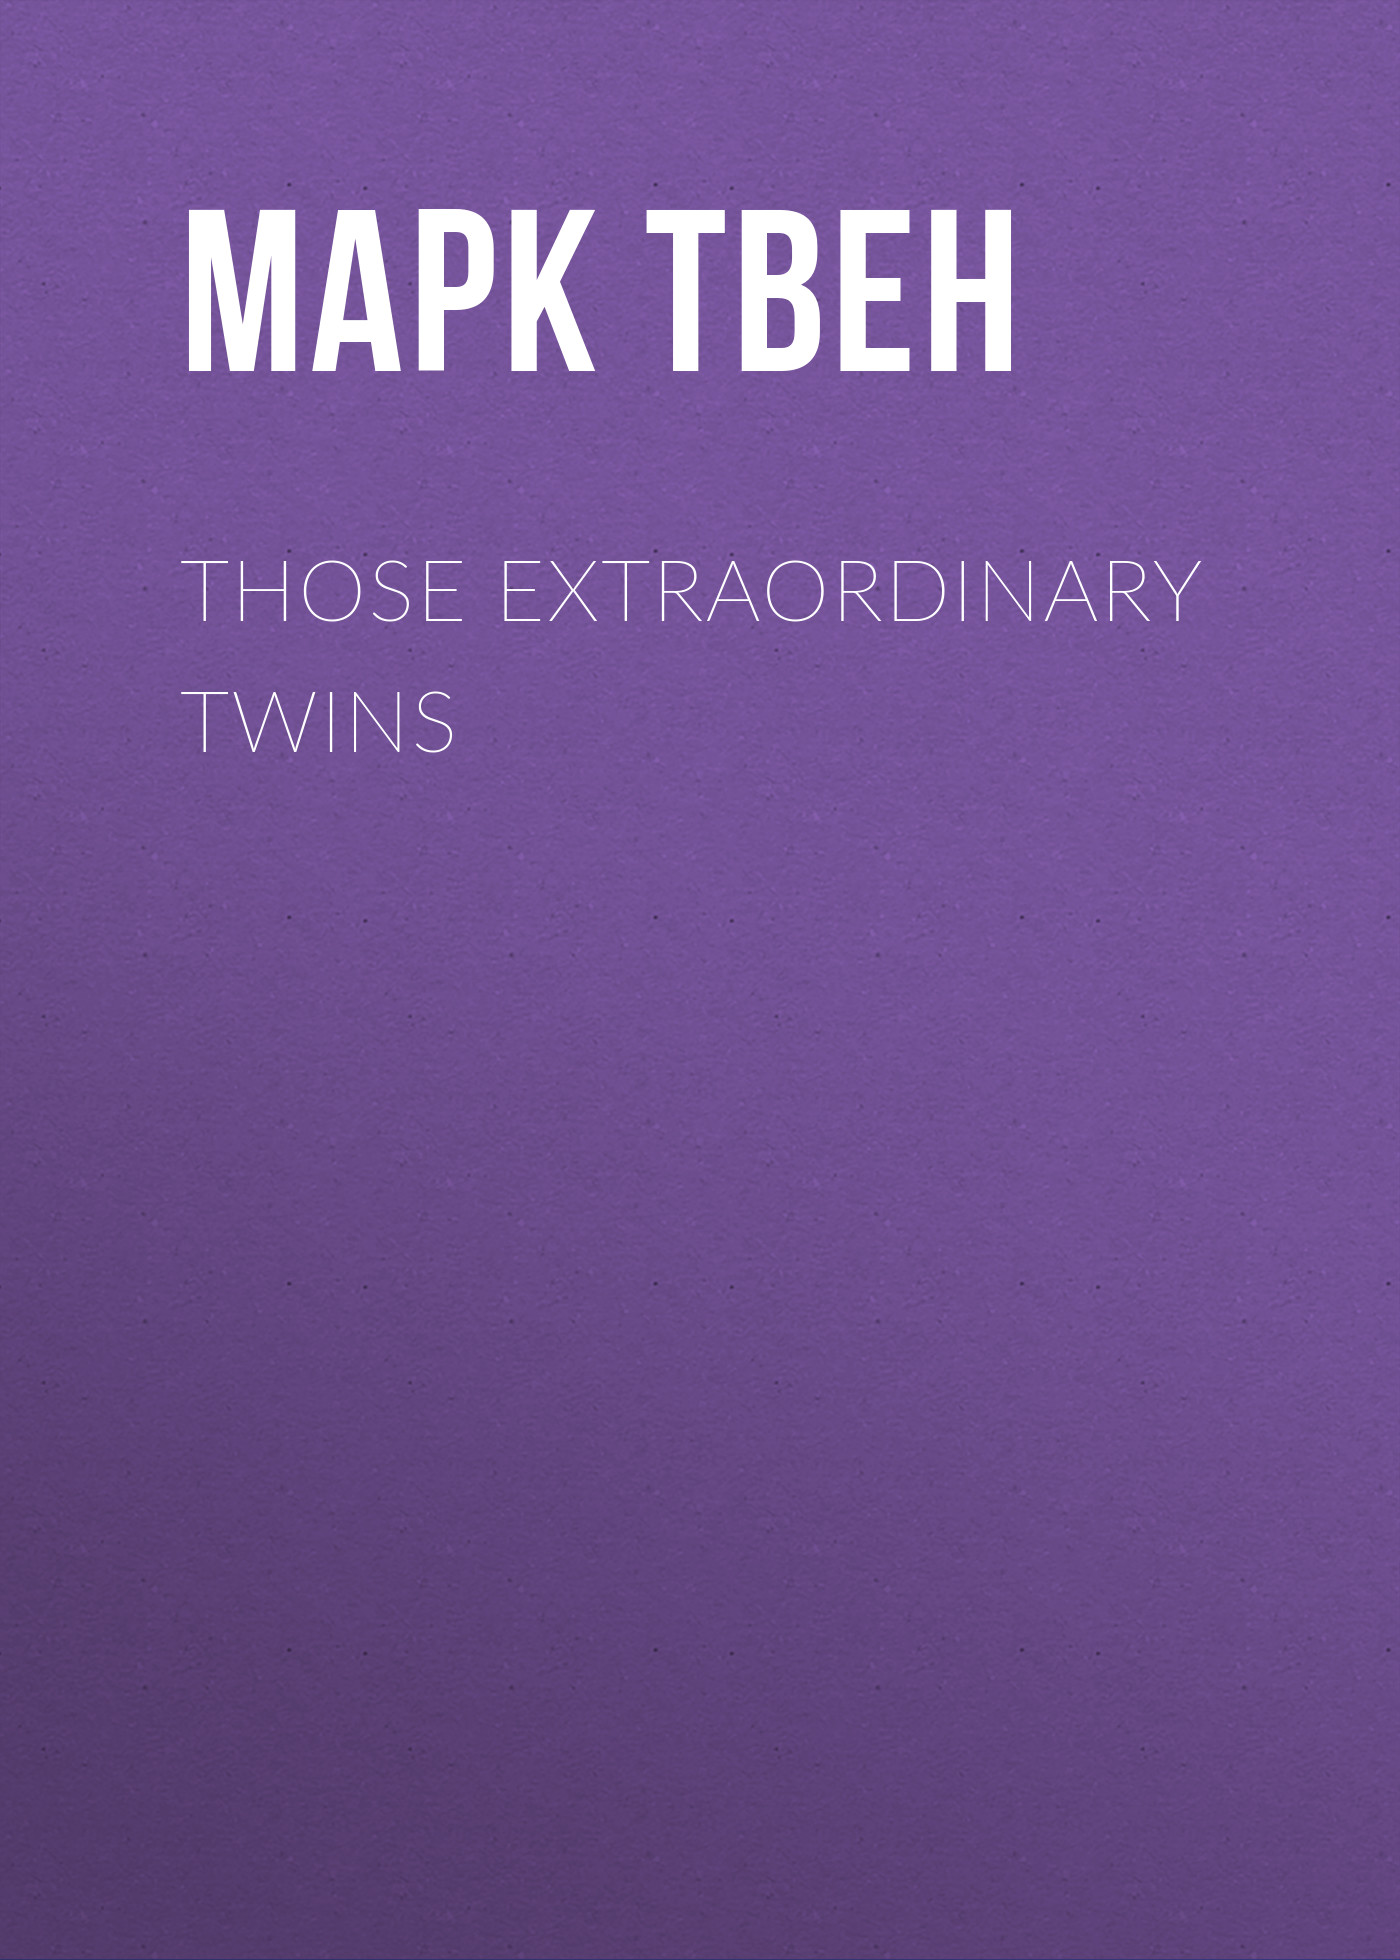 Марк Твен Those Extraordinary Twins extraordinary 28 35 dsyuj